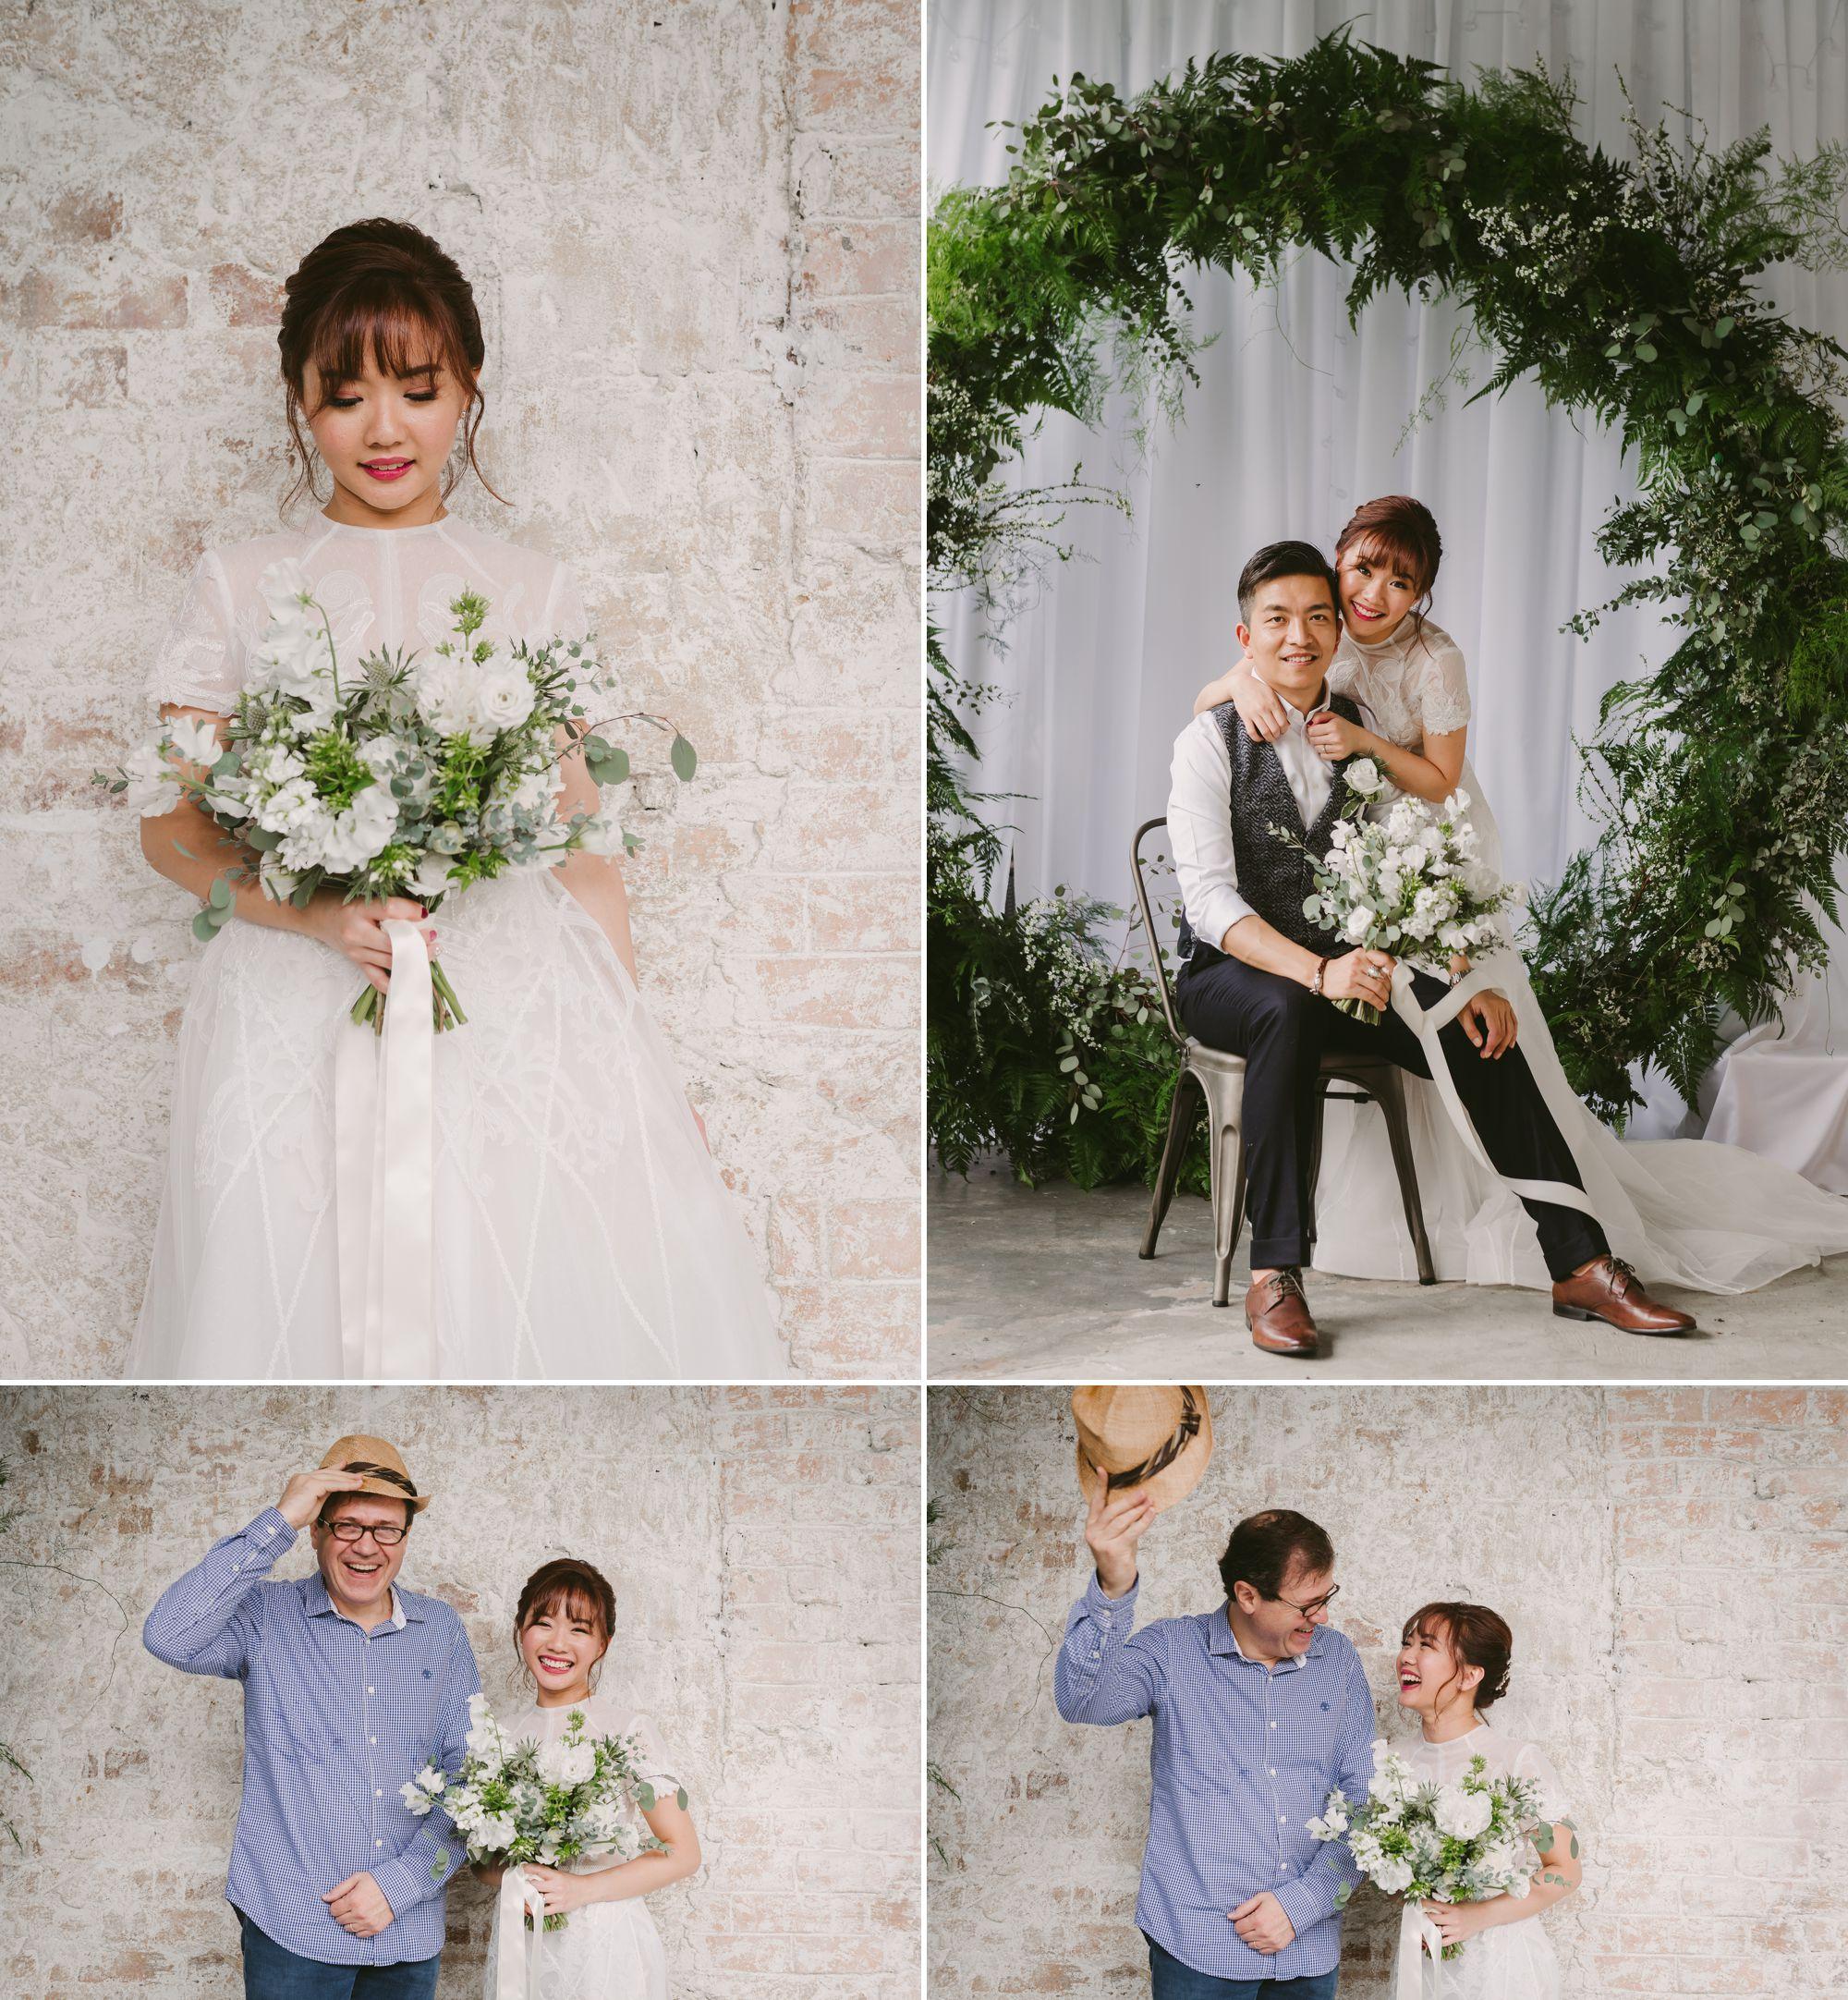 wedding_photography 10.jpg